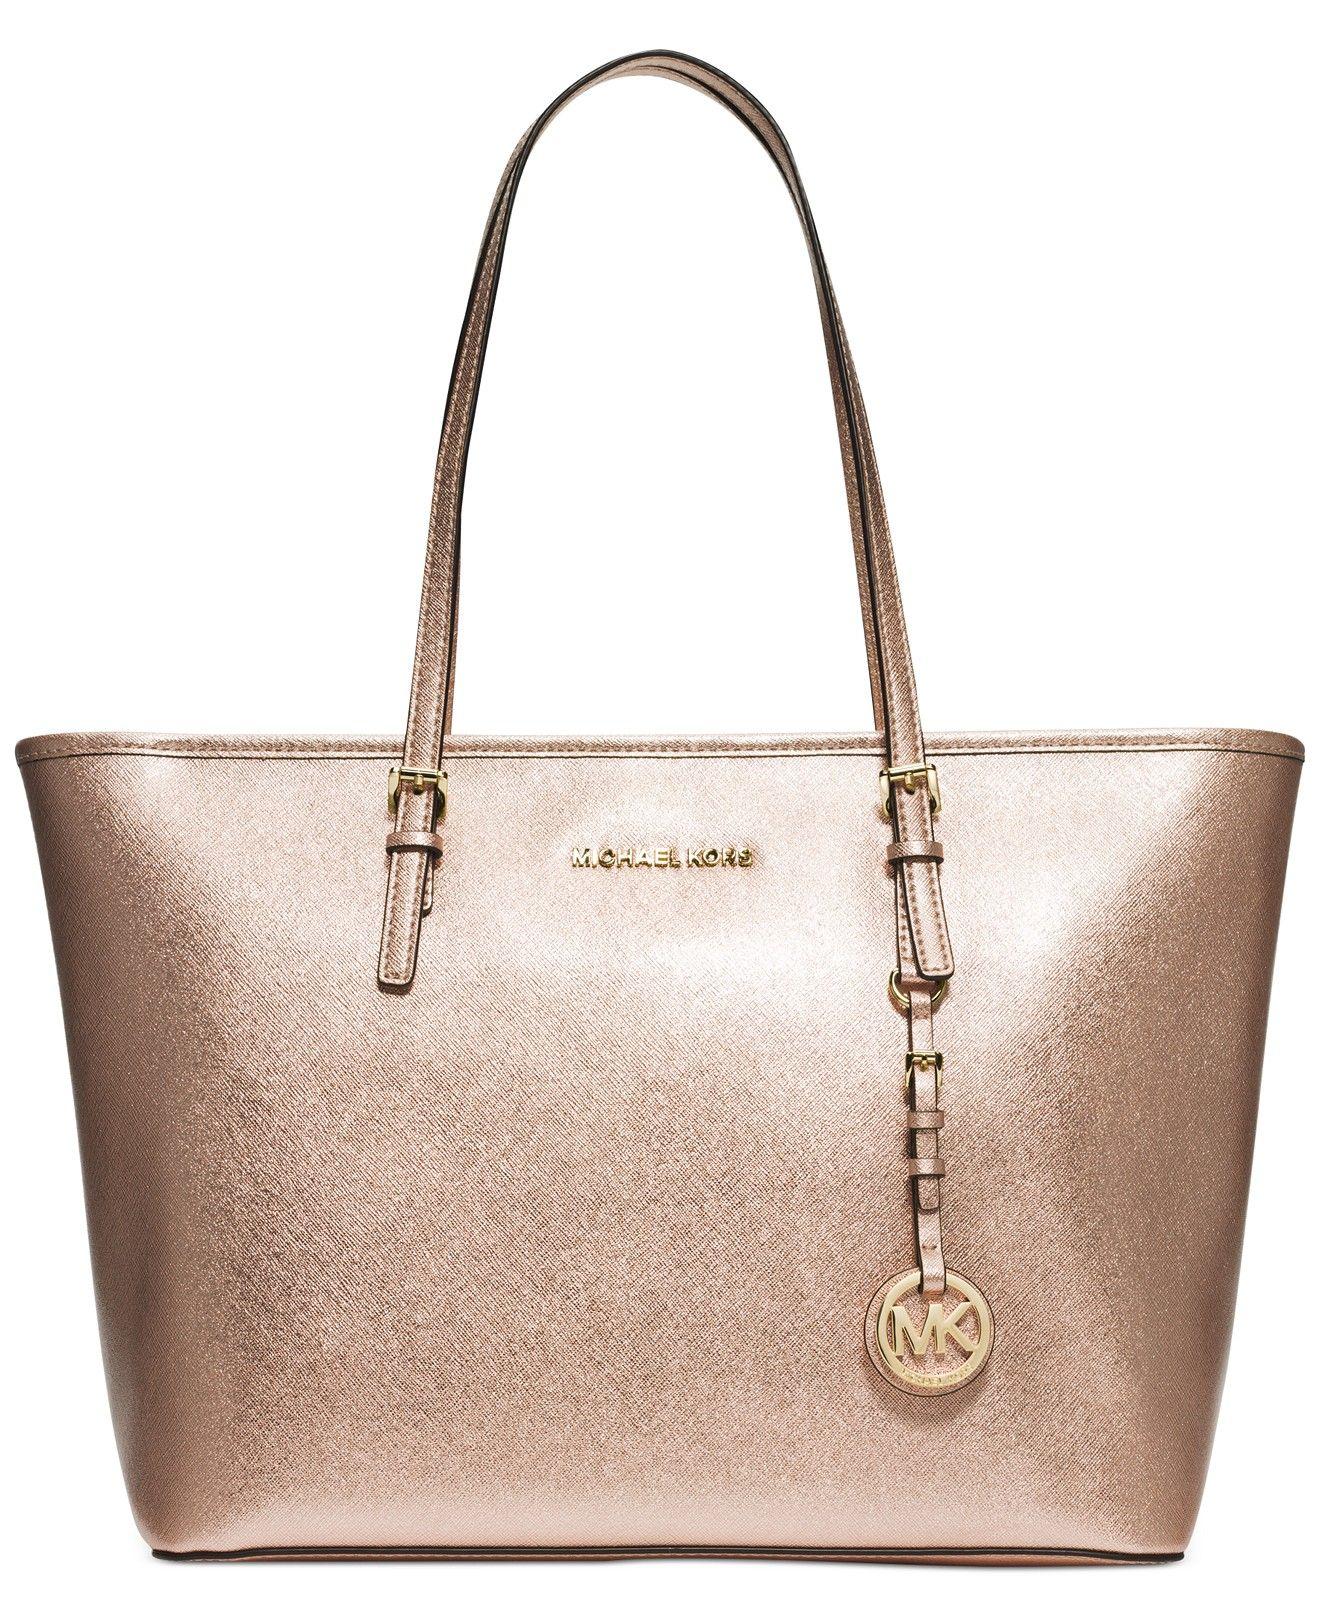 MICHAEL Michael Kors Jet Set Travel Top Zip Tote - Sale \u0026 Clearance -  Handbags \u0026